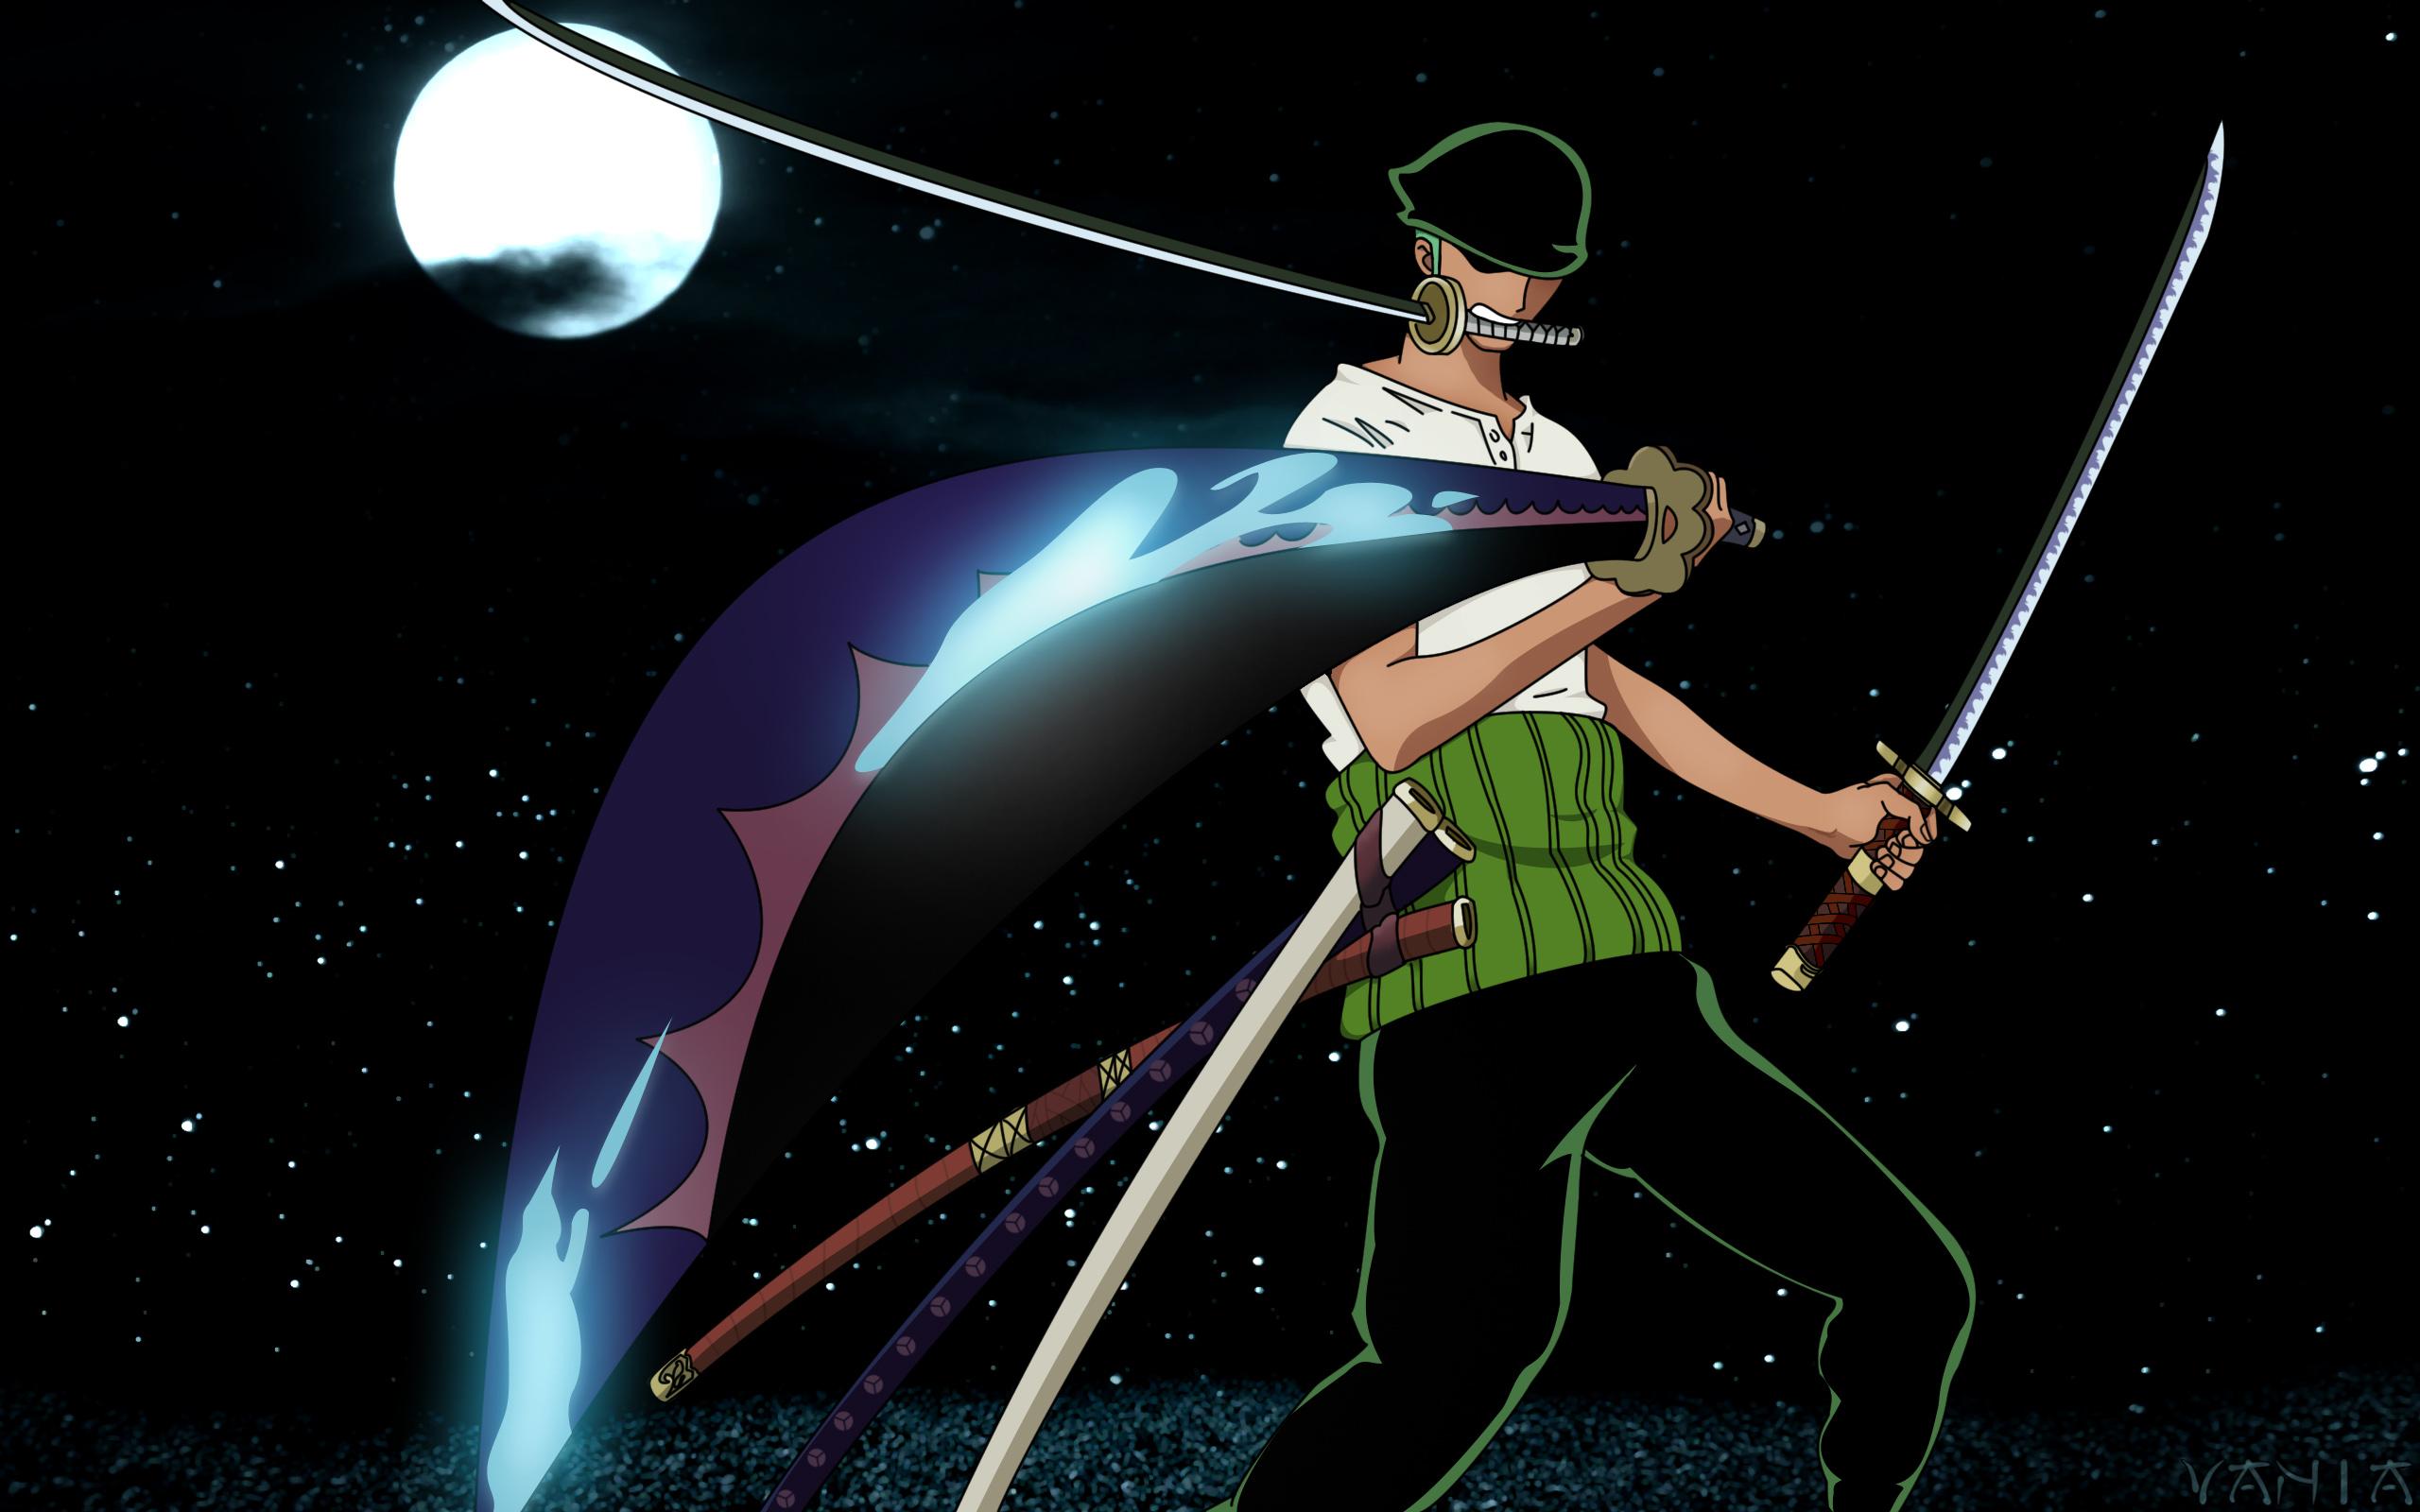 Roronoa Zoro Hd Wallpaper Zerochan Anime Image Board